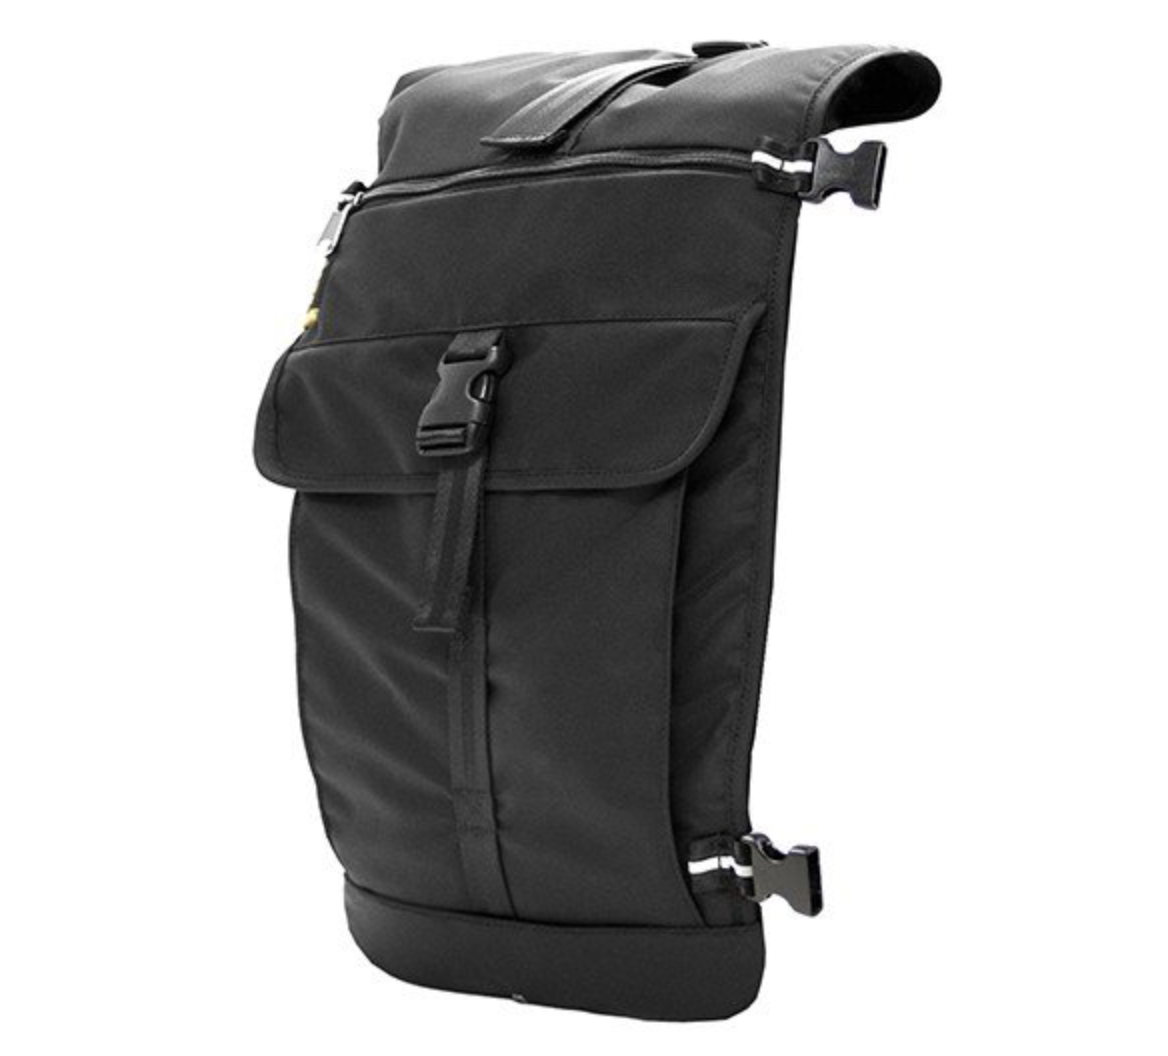 f:id:thebackpack:20190601174429p:plain